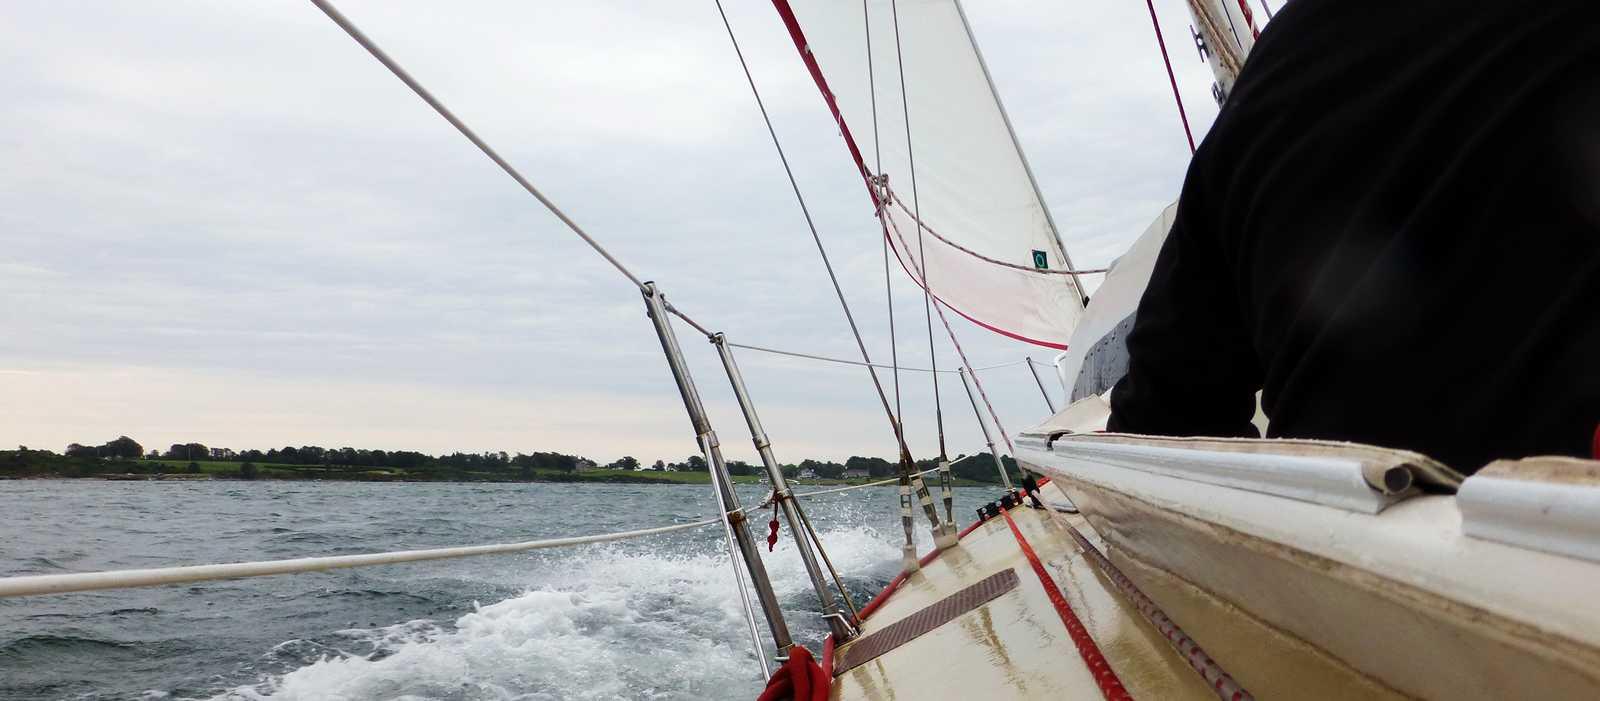 An Bord der Sightsailer